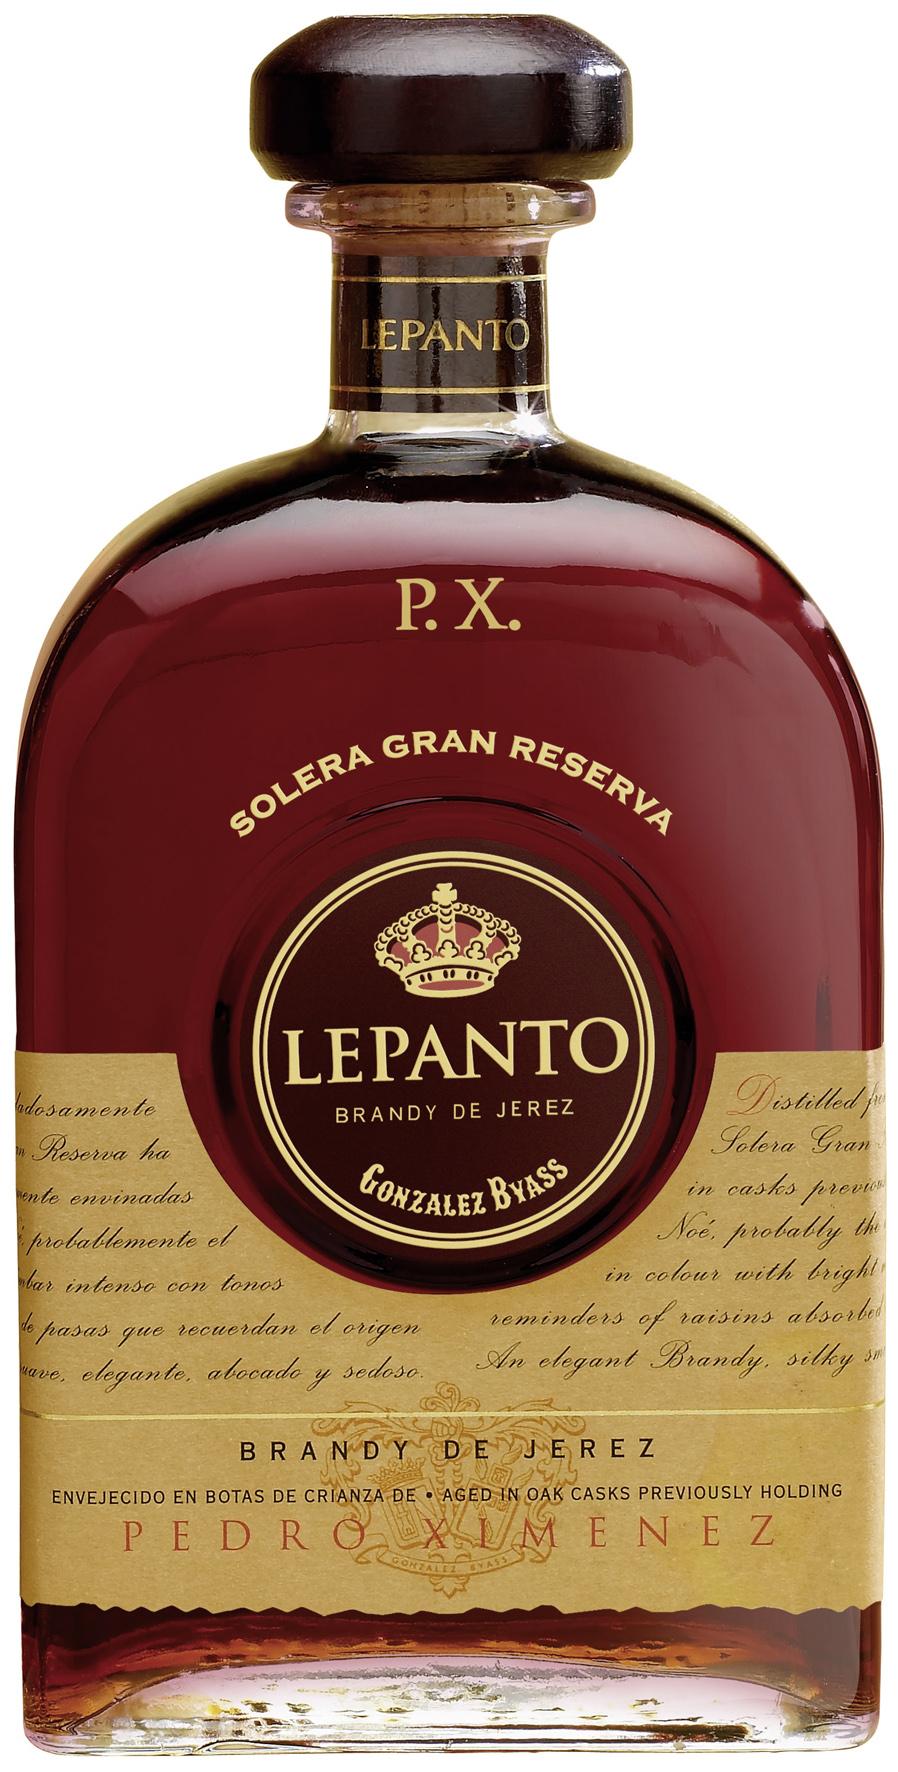 Lepanto Brandy Gran Reserva Ximenez P.X. 36% Vol.